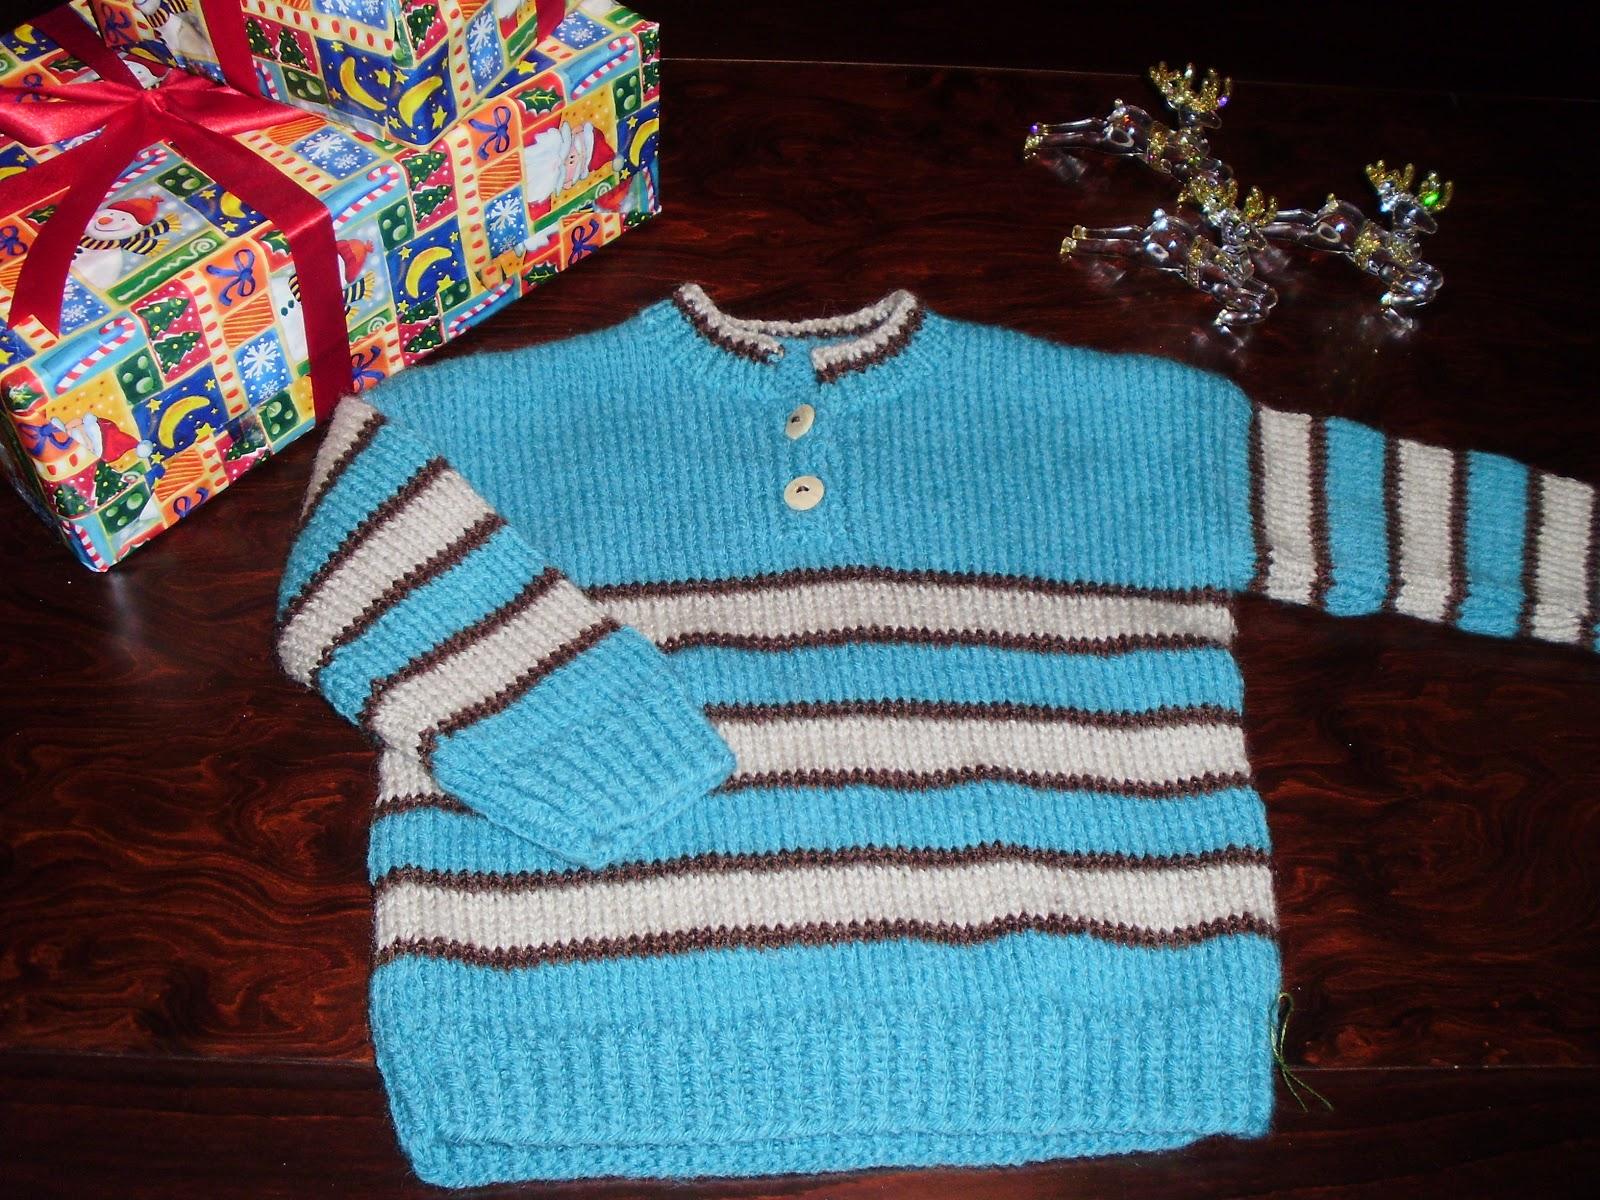 3aa3ed04d07 Χειροποίητο μάλλινο παιδικό πλεκτό πουλόβερ σε ριγέ σχέδιο για αγοράκια